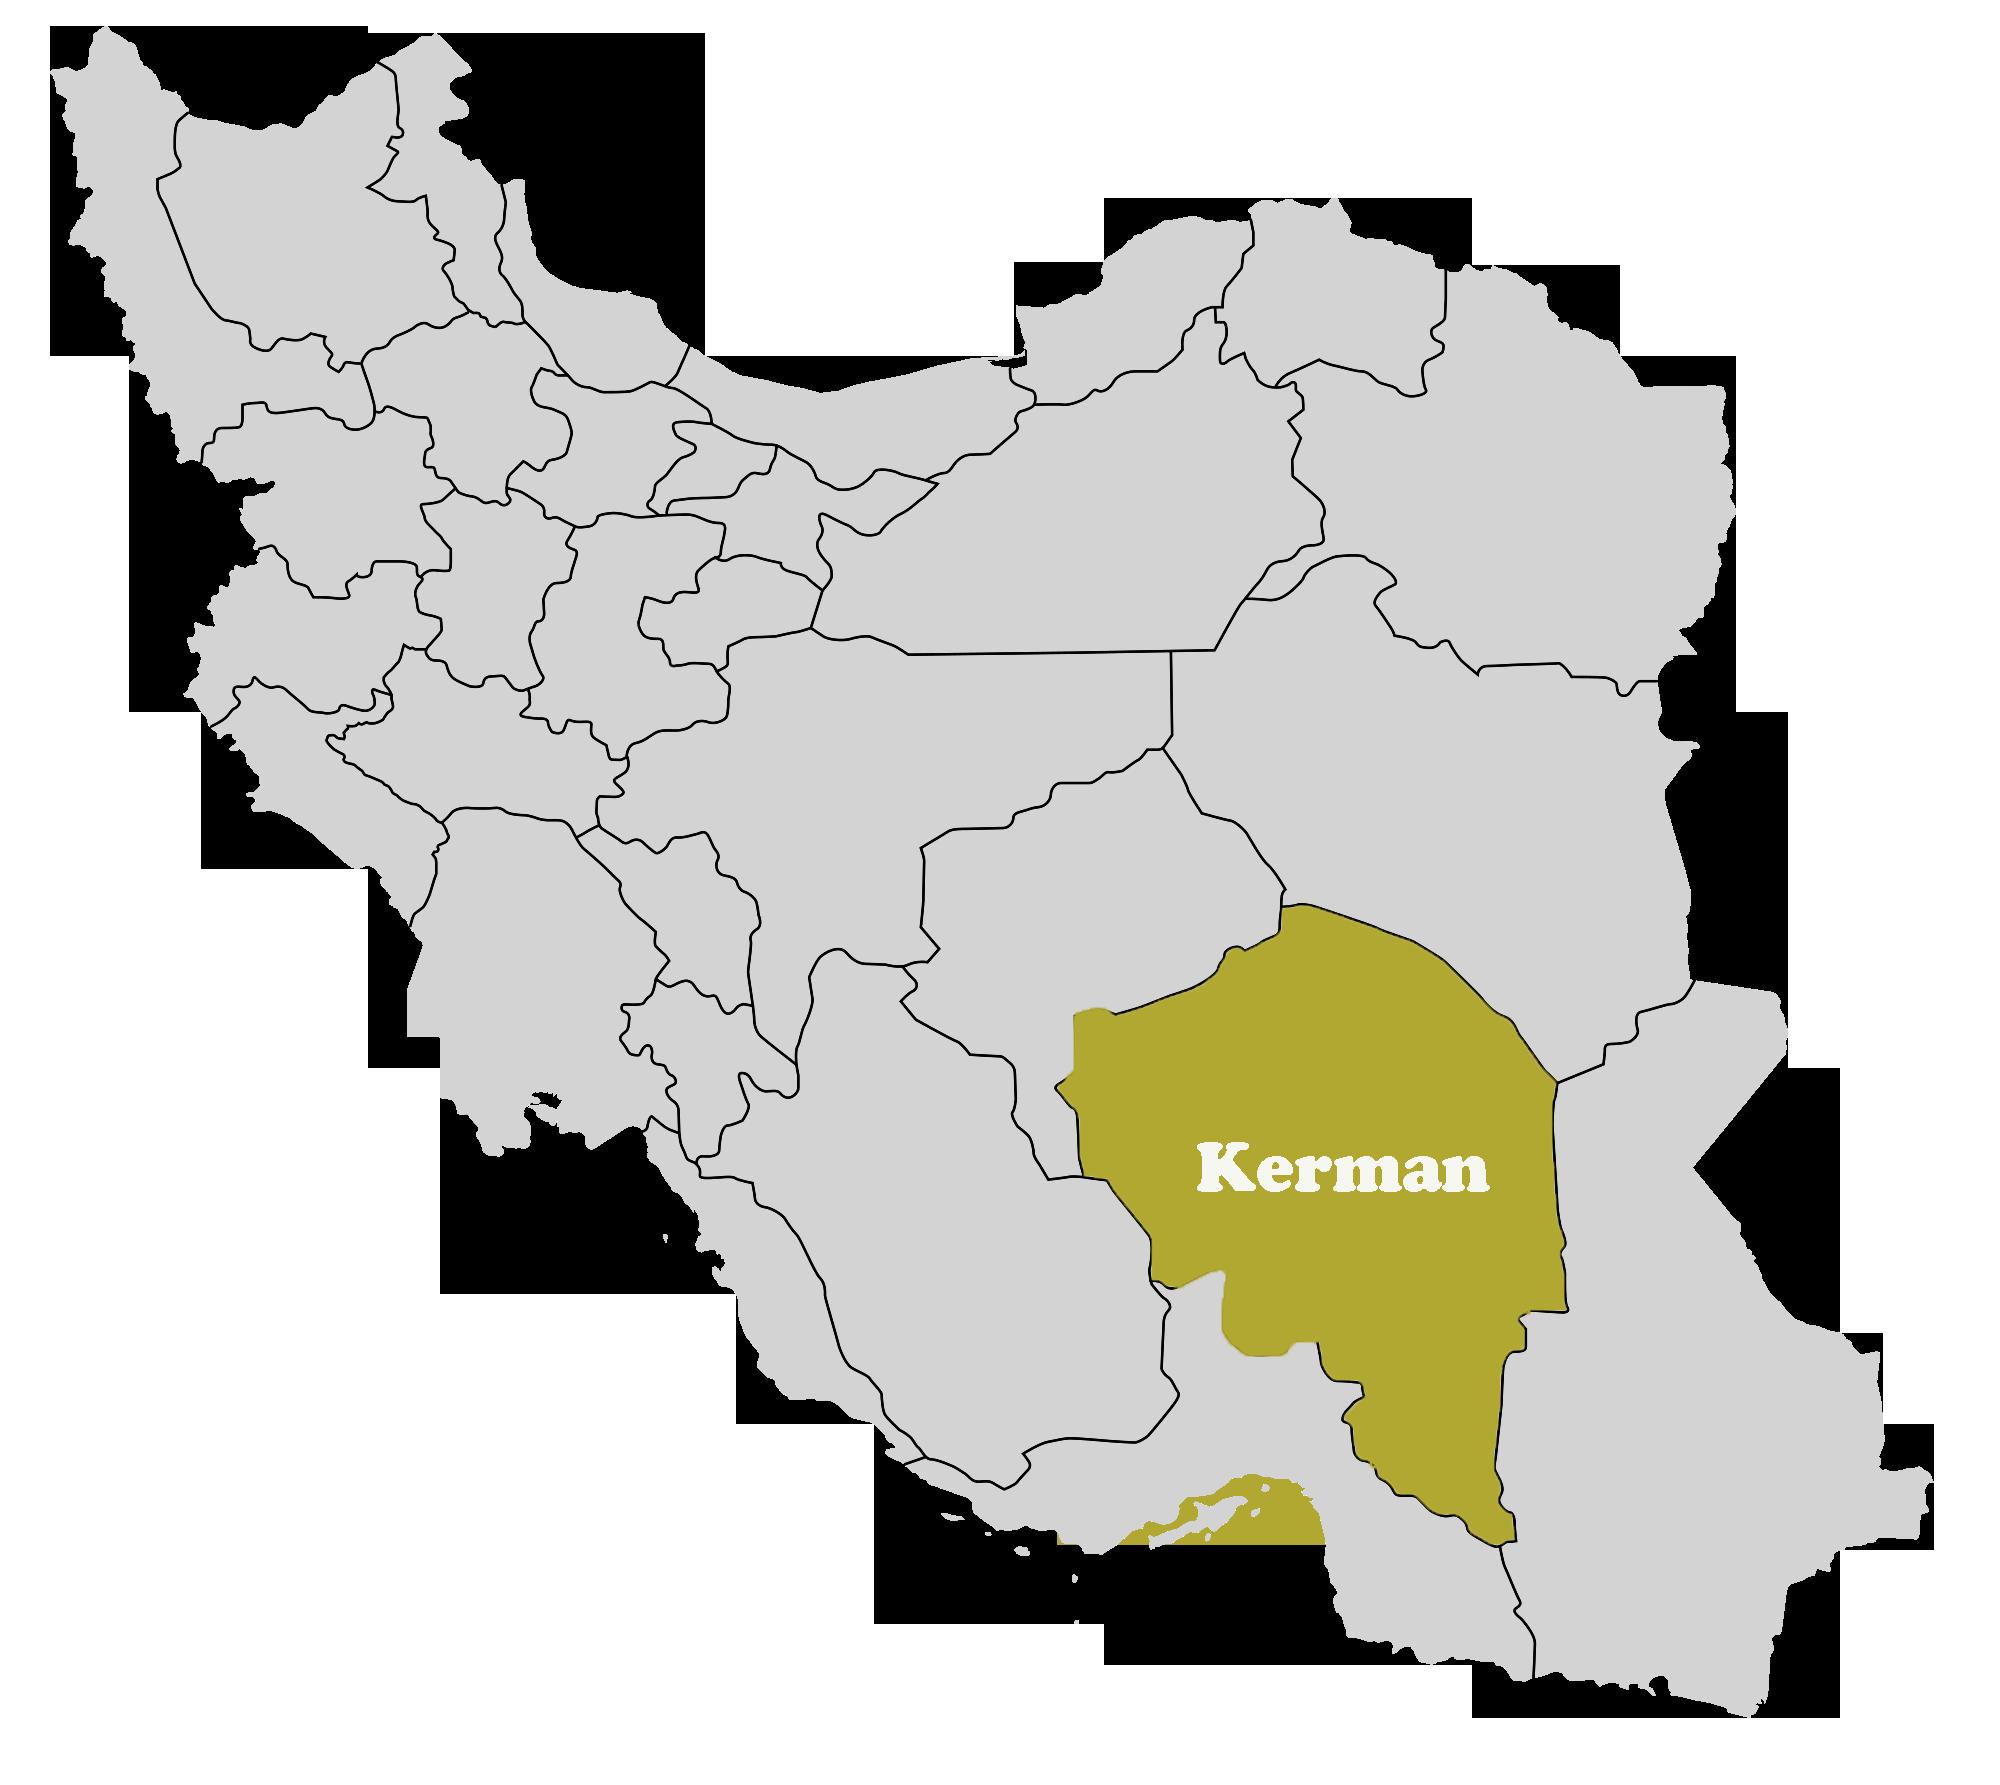 Kerman's Map